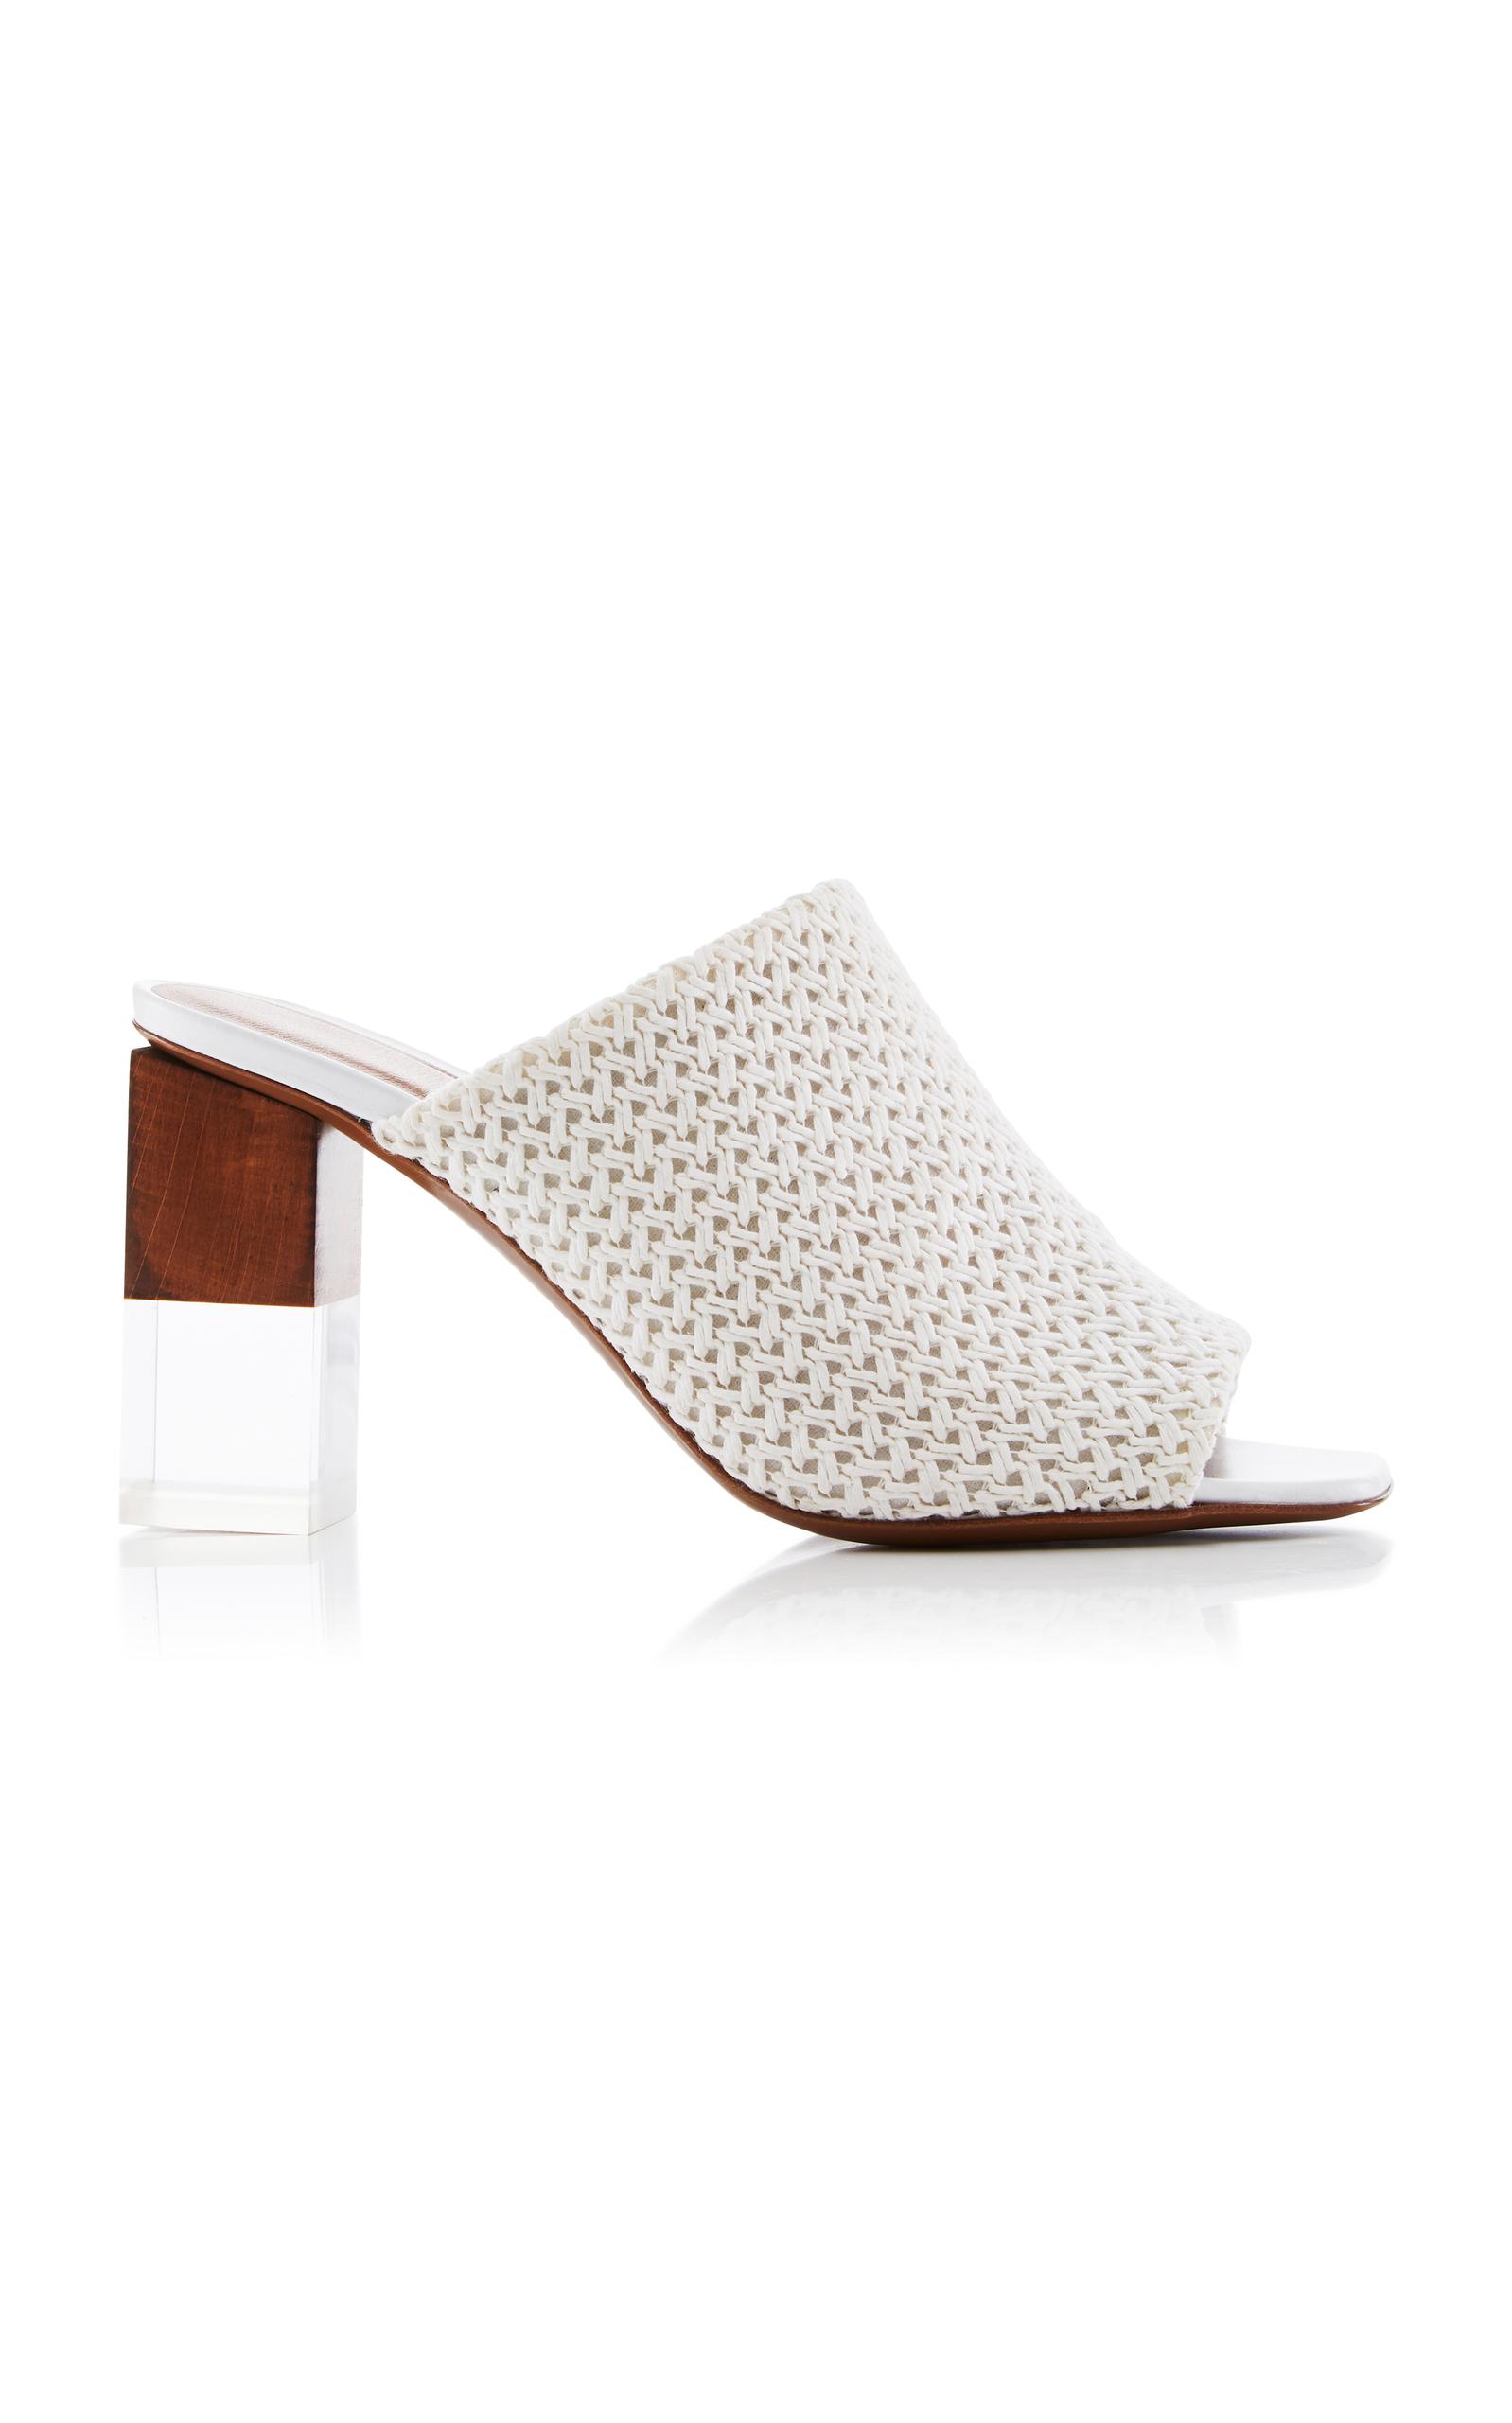 Neous Anguloa Knitted Sandals 9jYzMoVJN